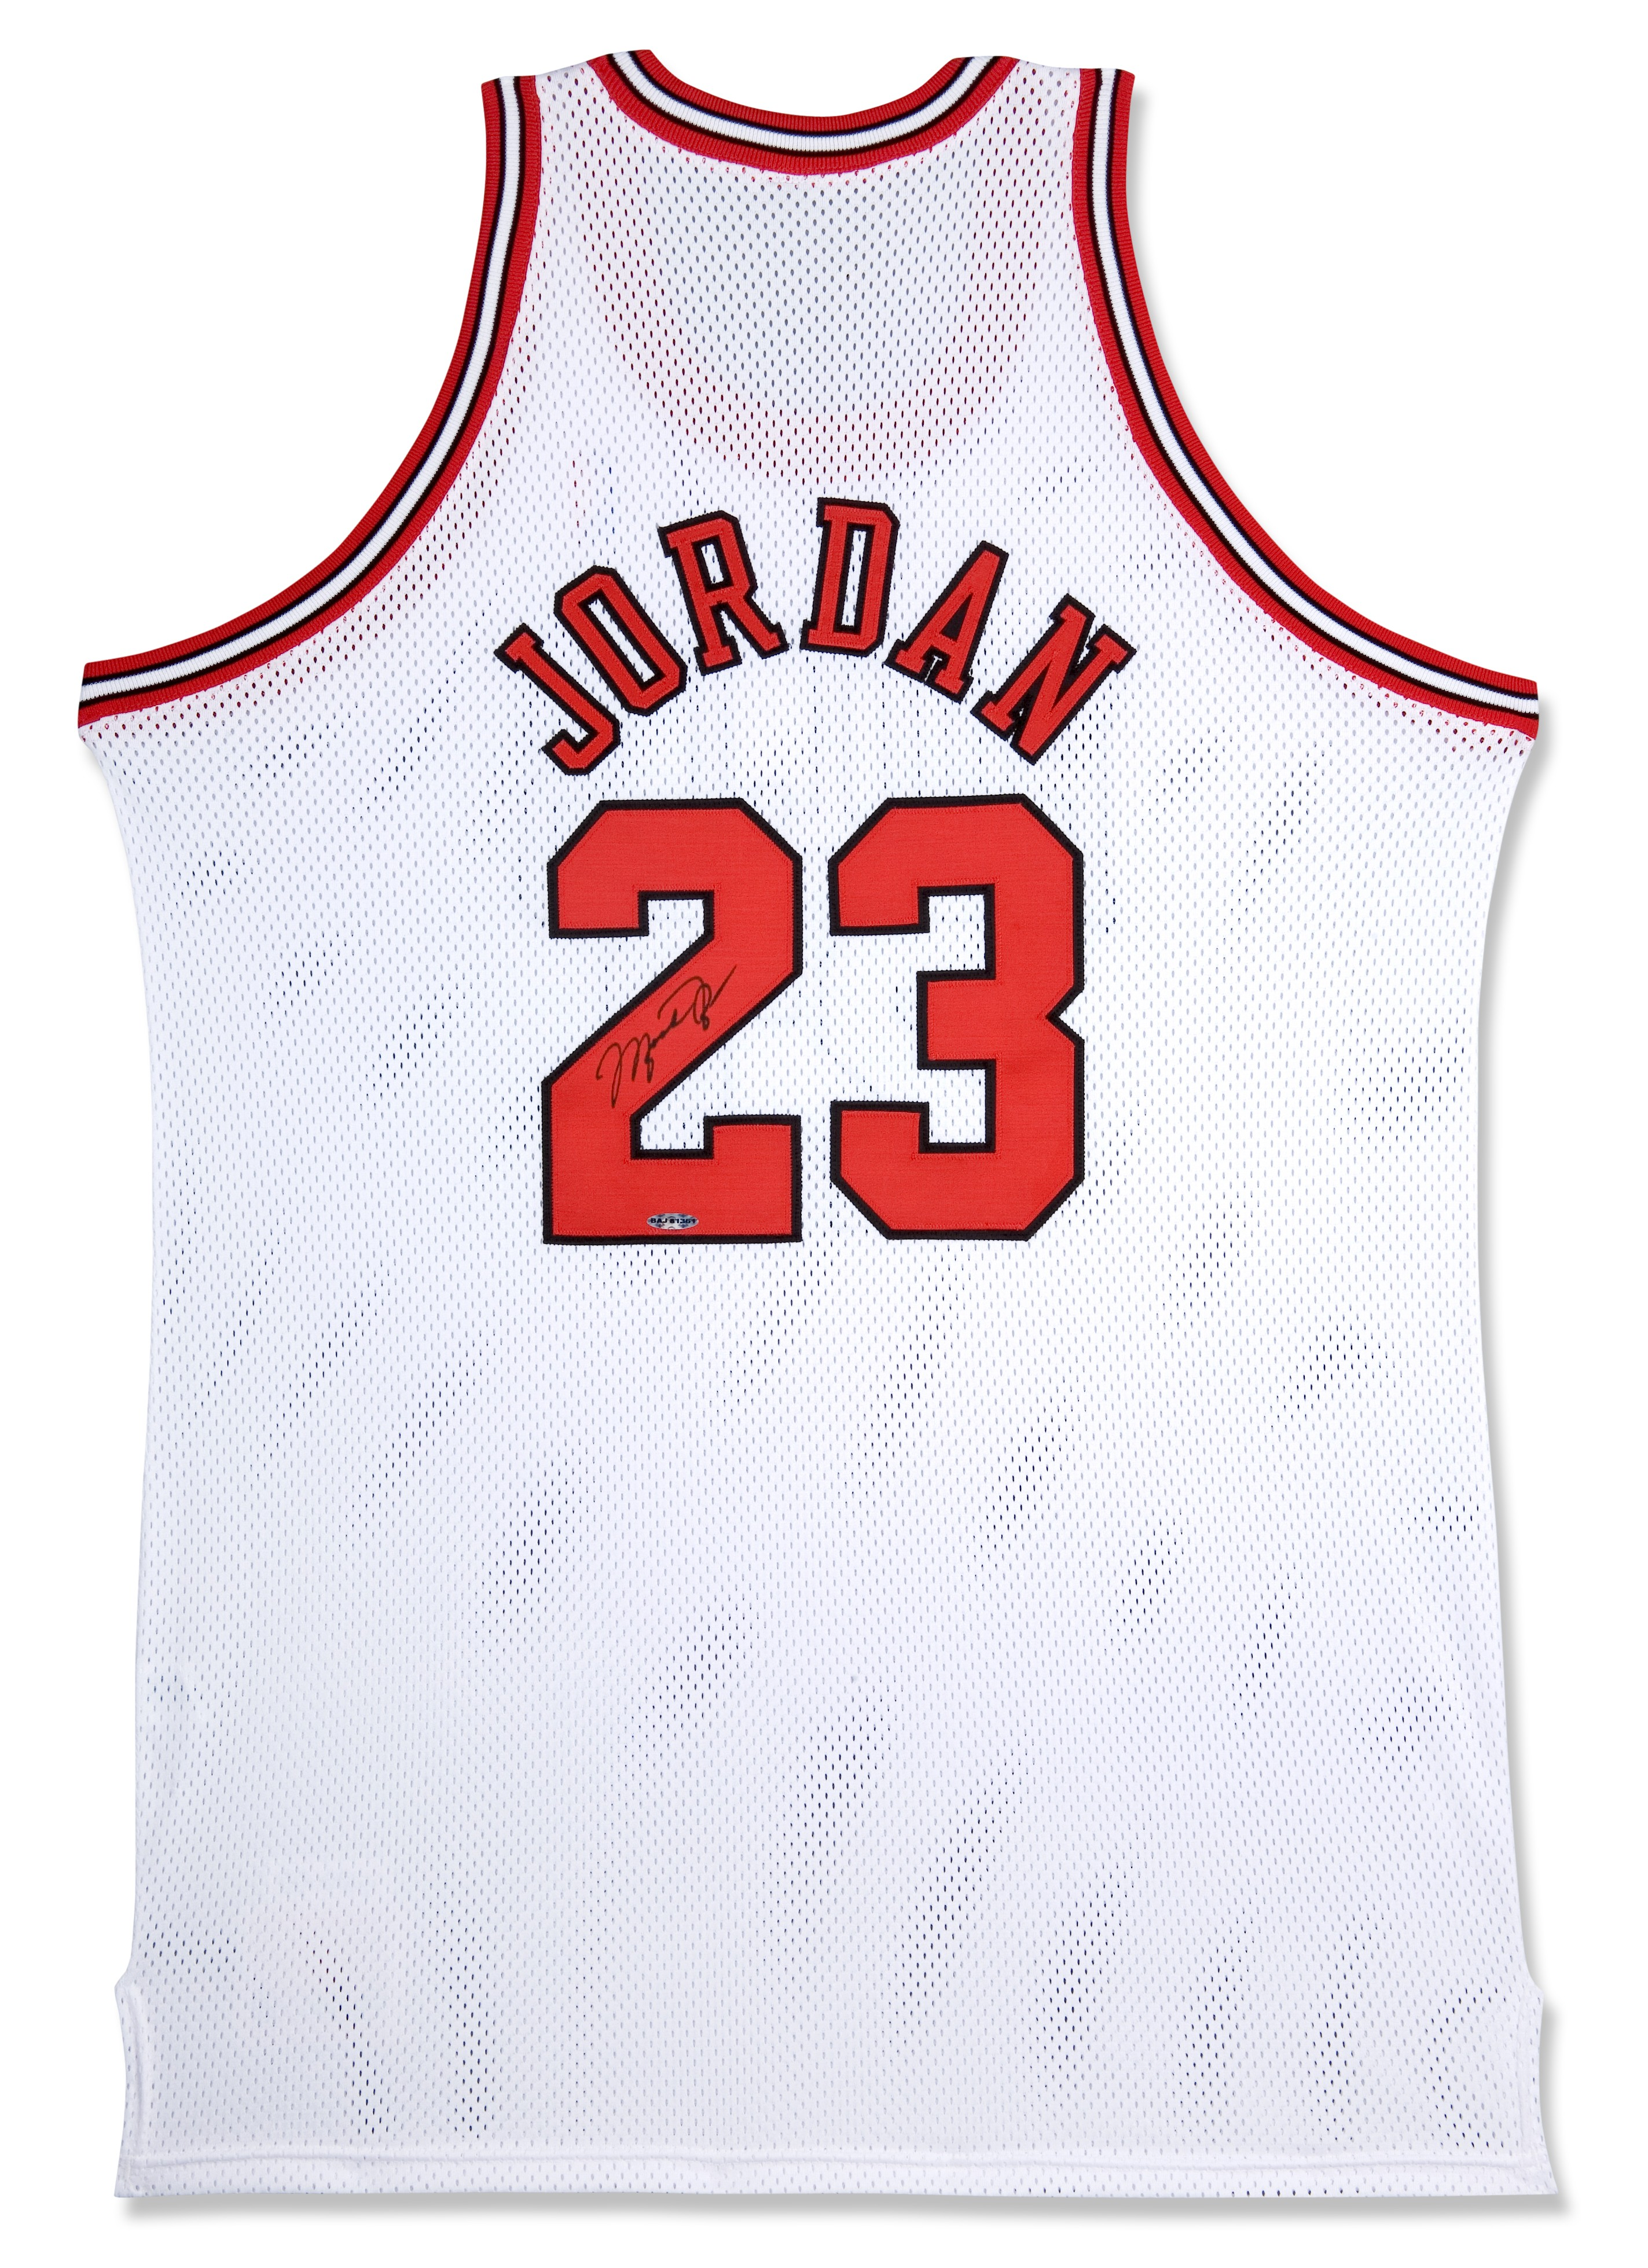 2847x3918 Michael Jordan Signed Chicago Bulls Home Jersey